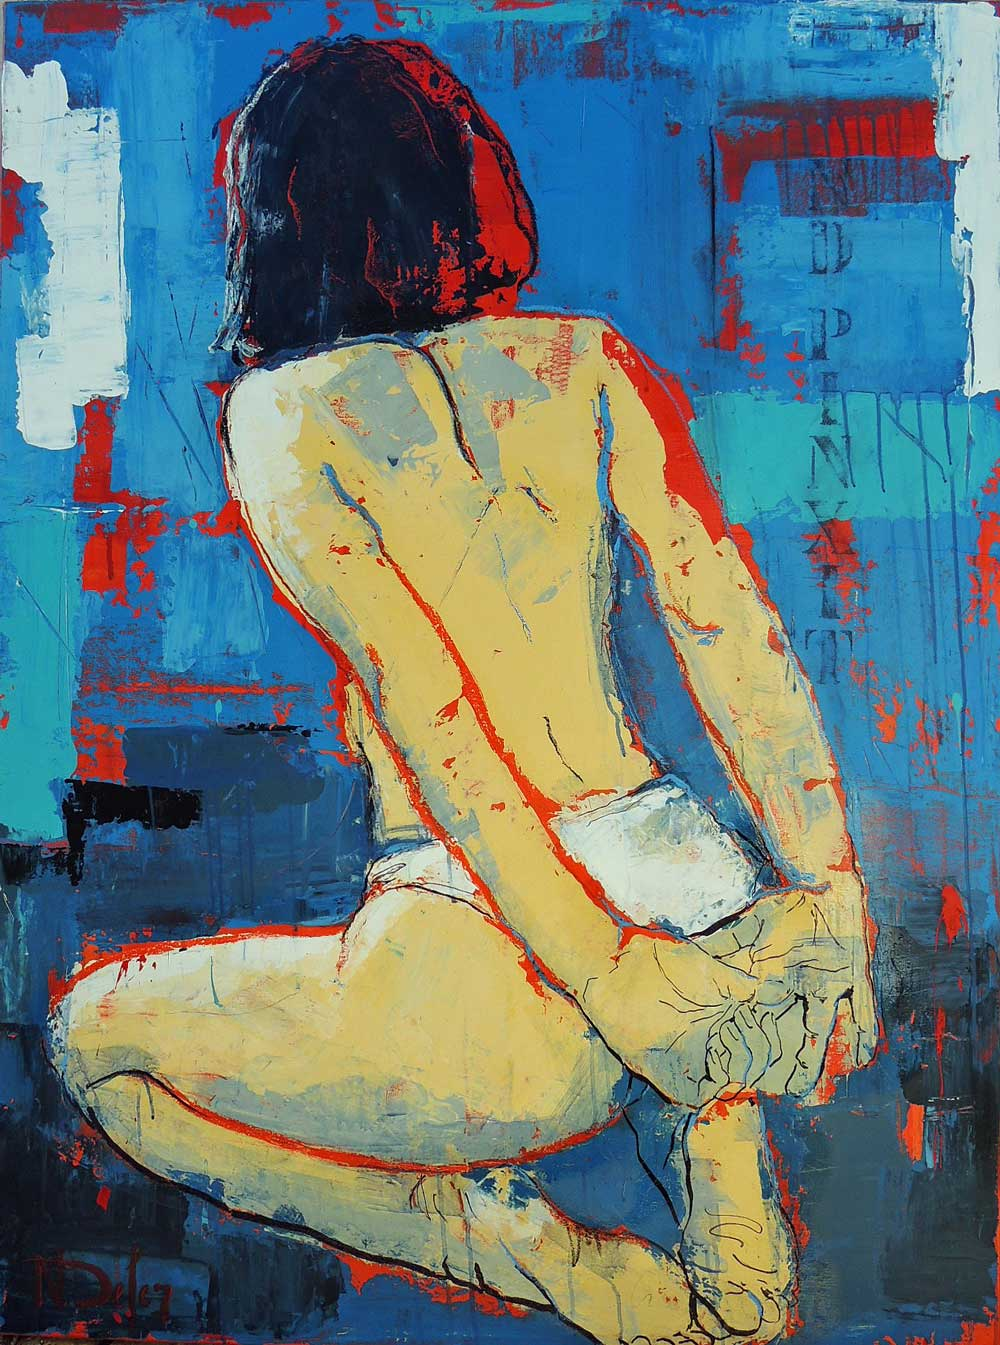 Richard Orlinski Wild Kong Galerie Bruxelles - Nadine DEFER sans-titre 97x130cm